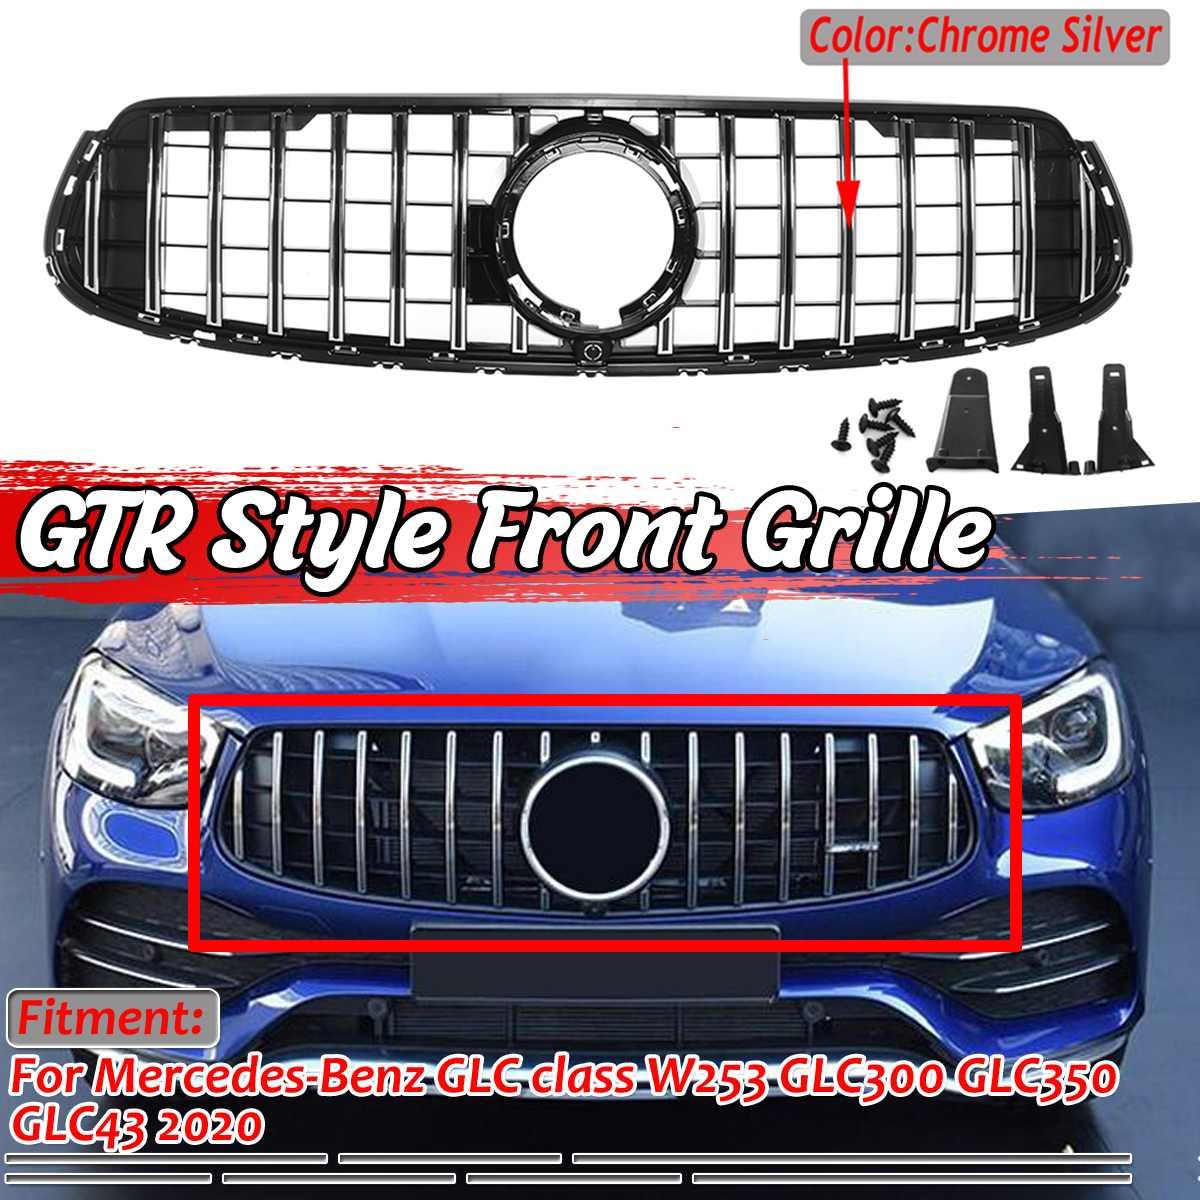 W253 GTR Style Grille Car Front Bumper Upper Grille Grill For Mercedes For Benz GLC Class W253 GLC300 GLC350 GLC43 2020